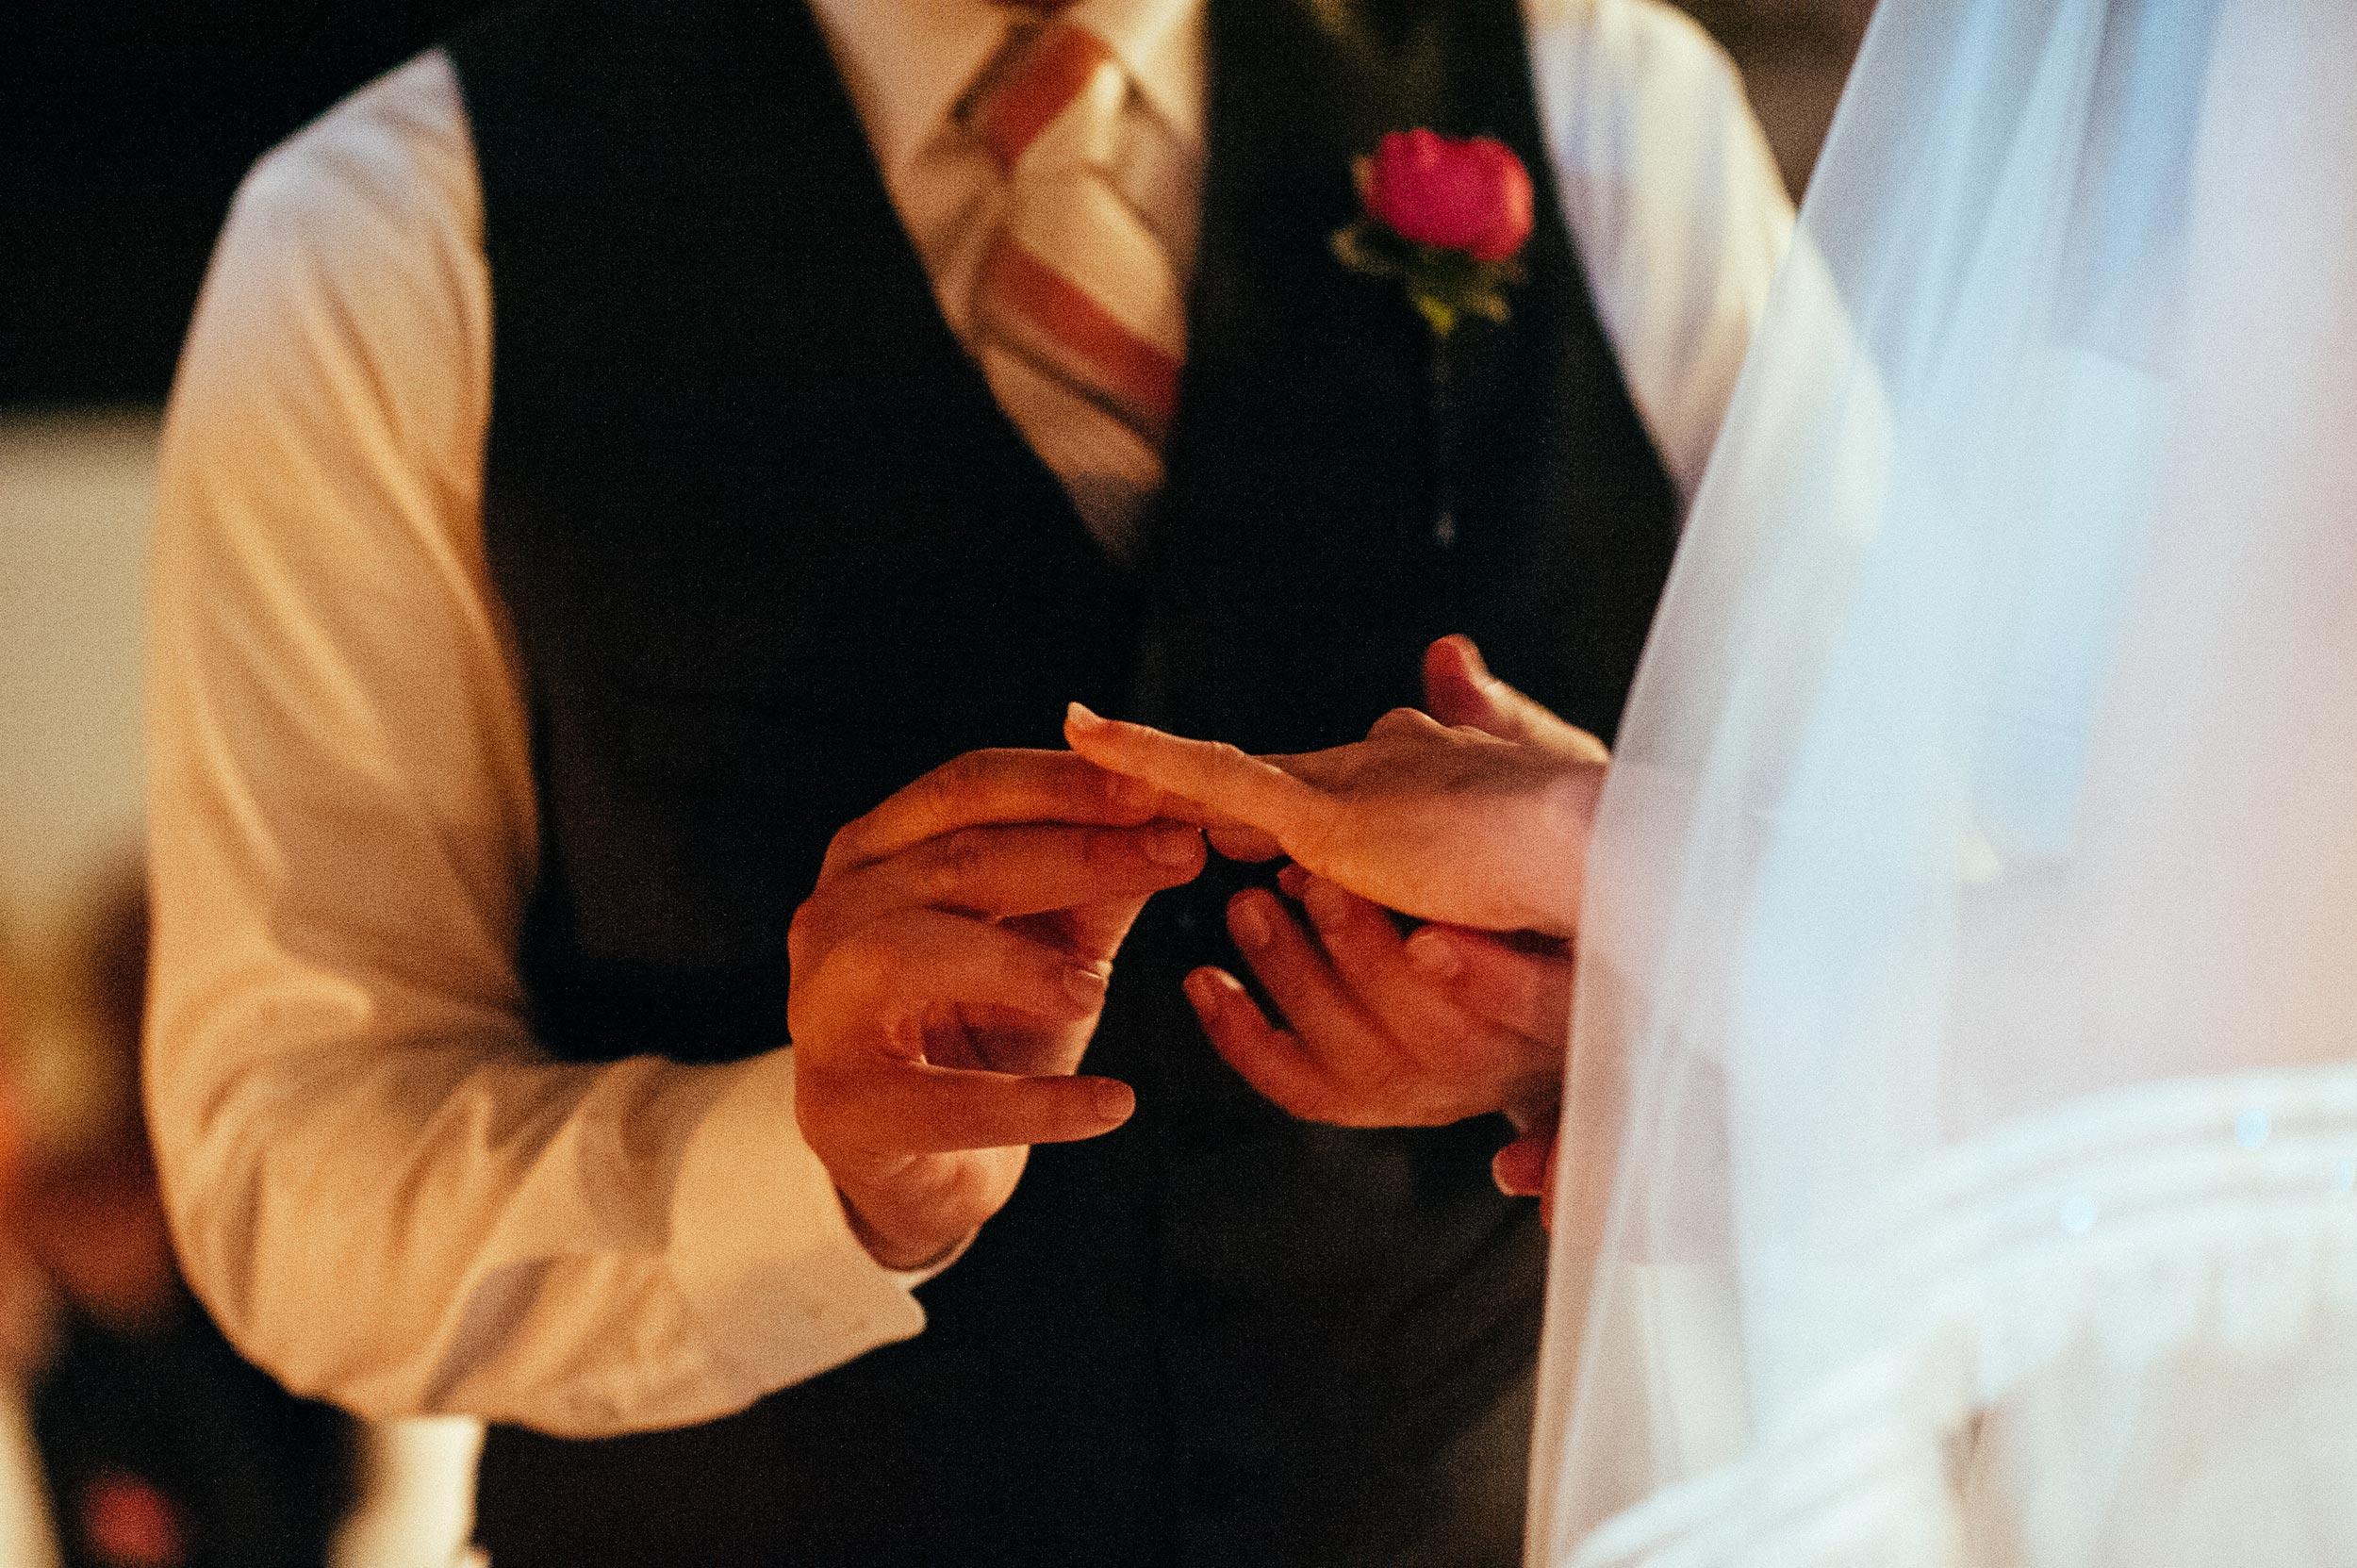 2014-Shelby-Jocelyn-Santo-Stefano-Di-Sessanio-Wedding-Photographer-Italy-Alessandro-Avenali-31.jpg